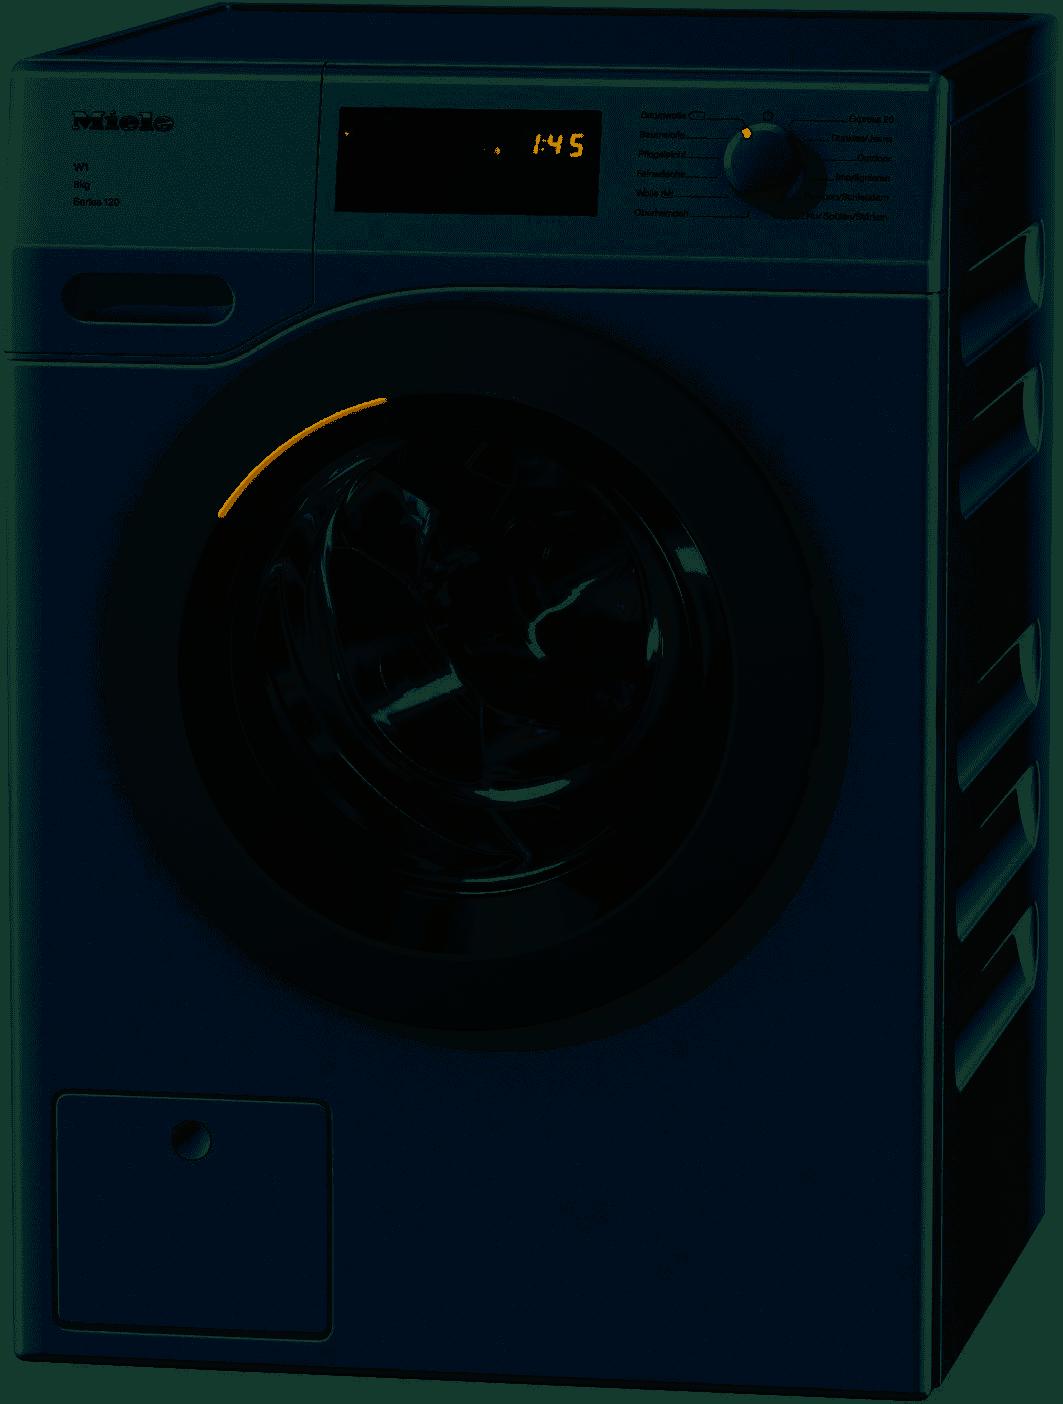 miele waschmaschine wdd035wcs neu waschmaschinen. Black Bedroom Furniture Sets. Home Design Ideas